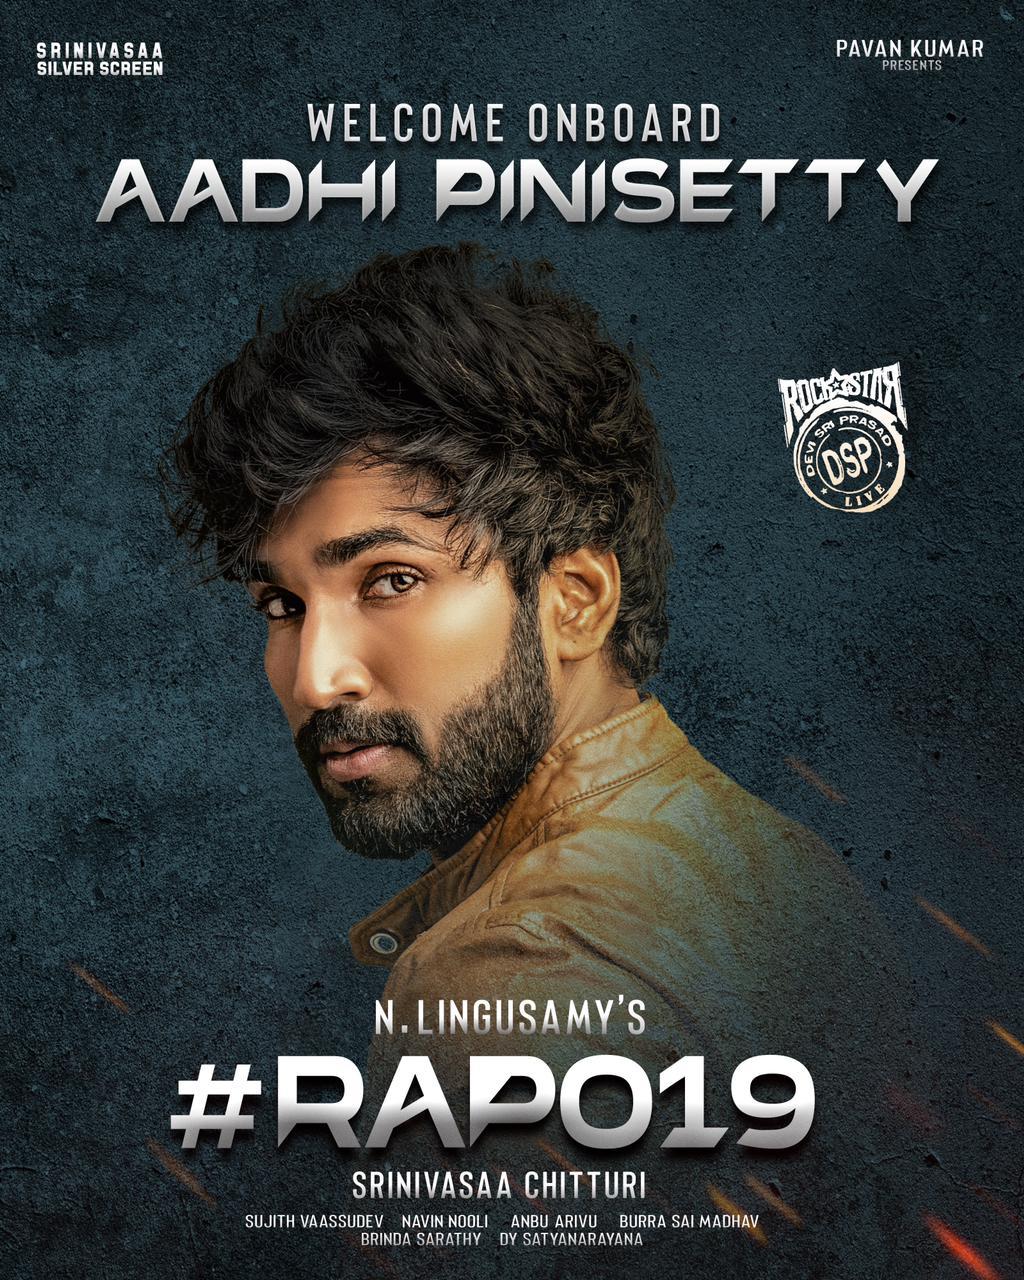 Actor Aadhi Pinisetty to lock horns with Ram Pothineni in RAPO19